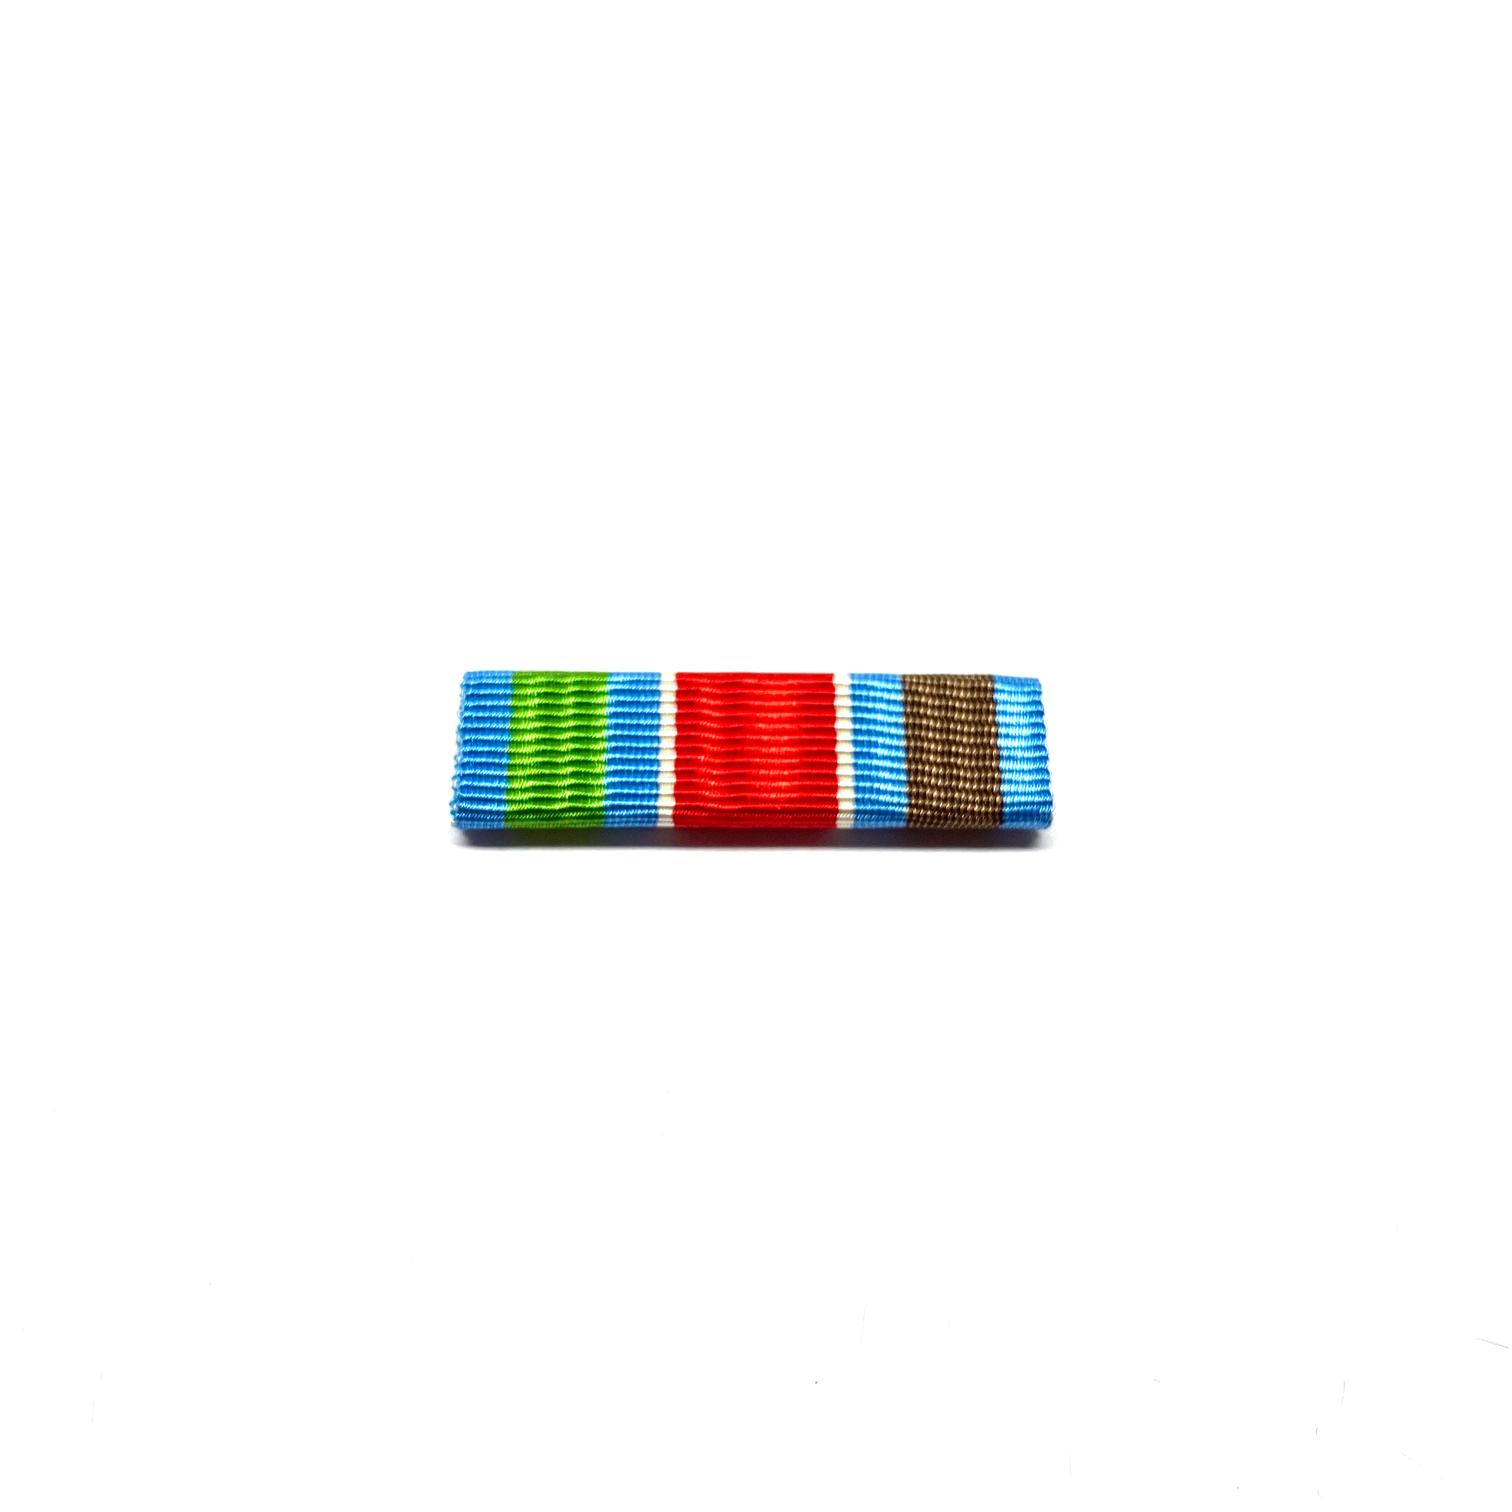 Médaille ONU - Yougoslavie